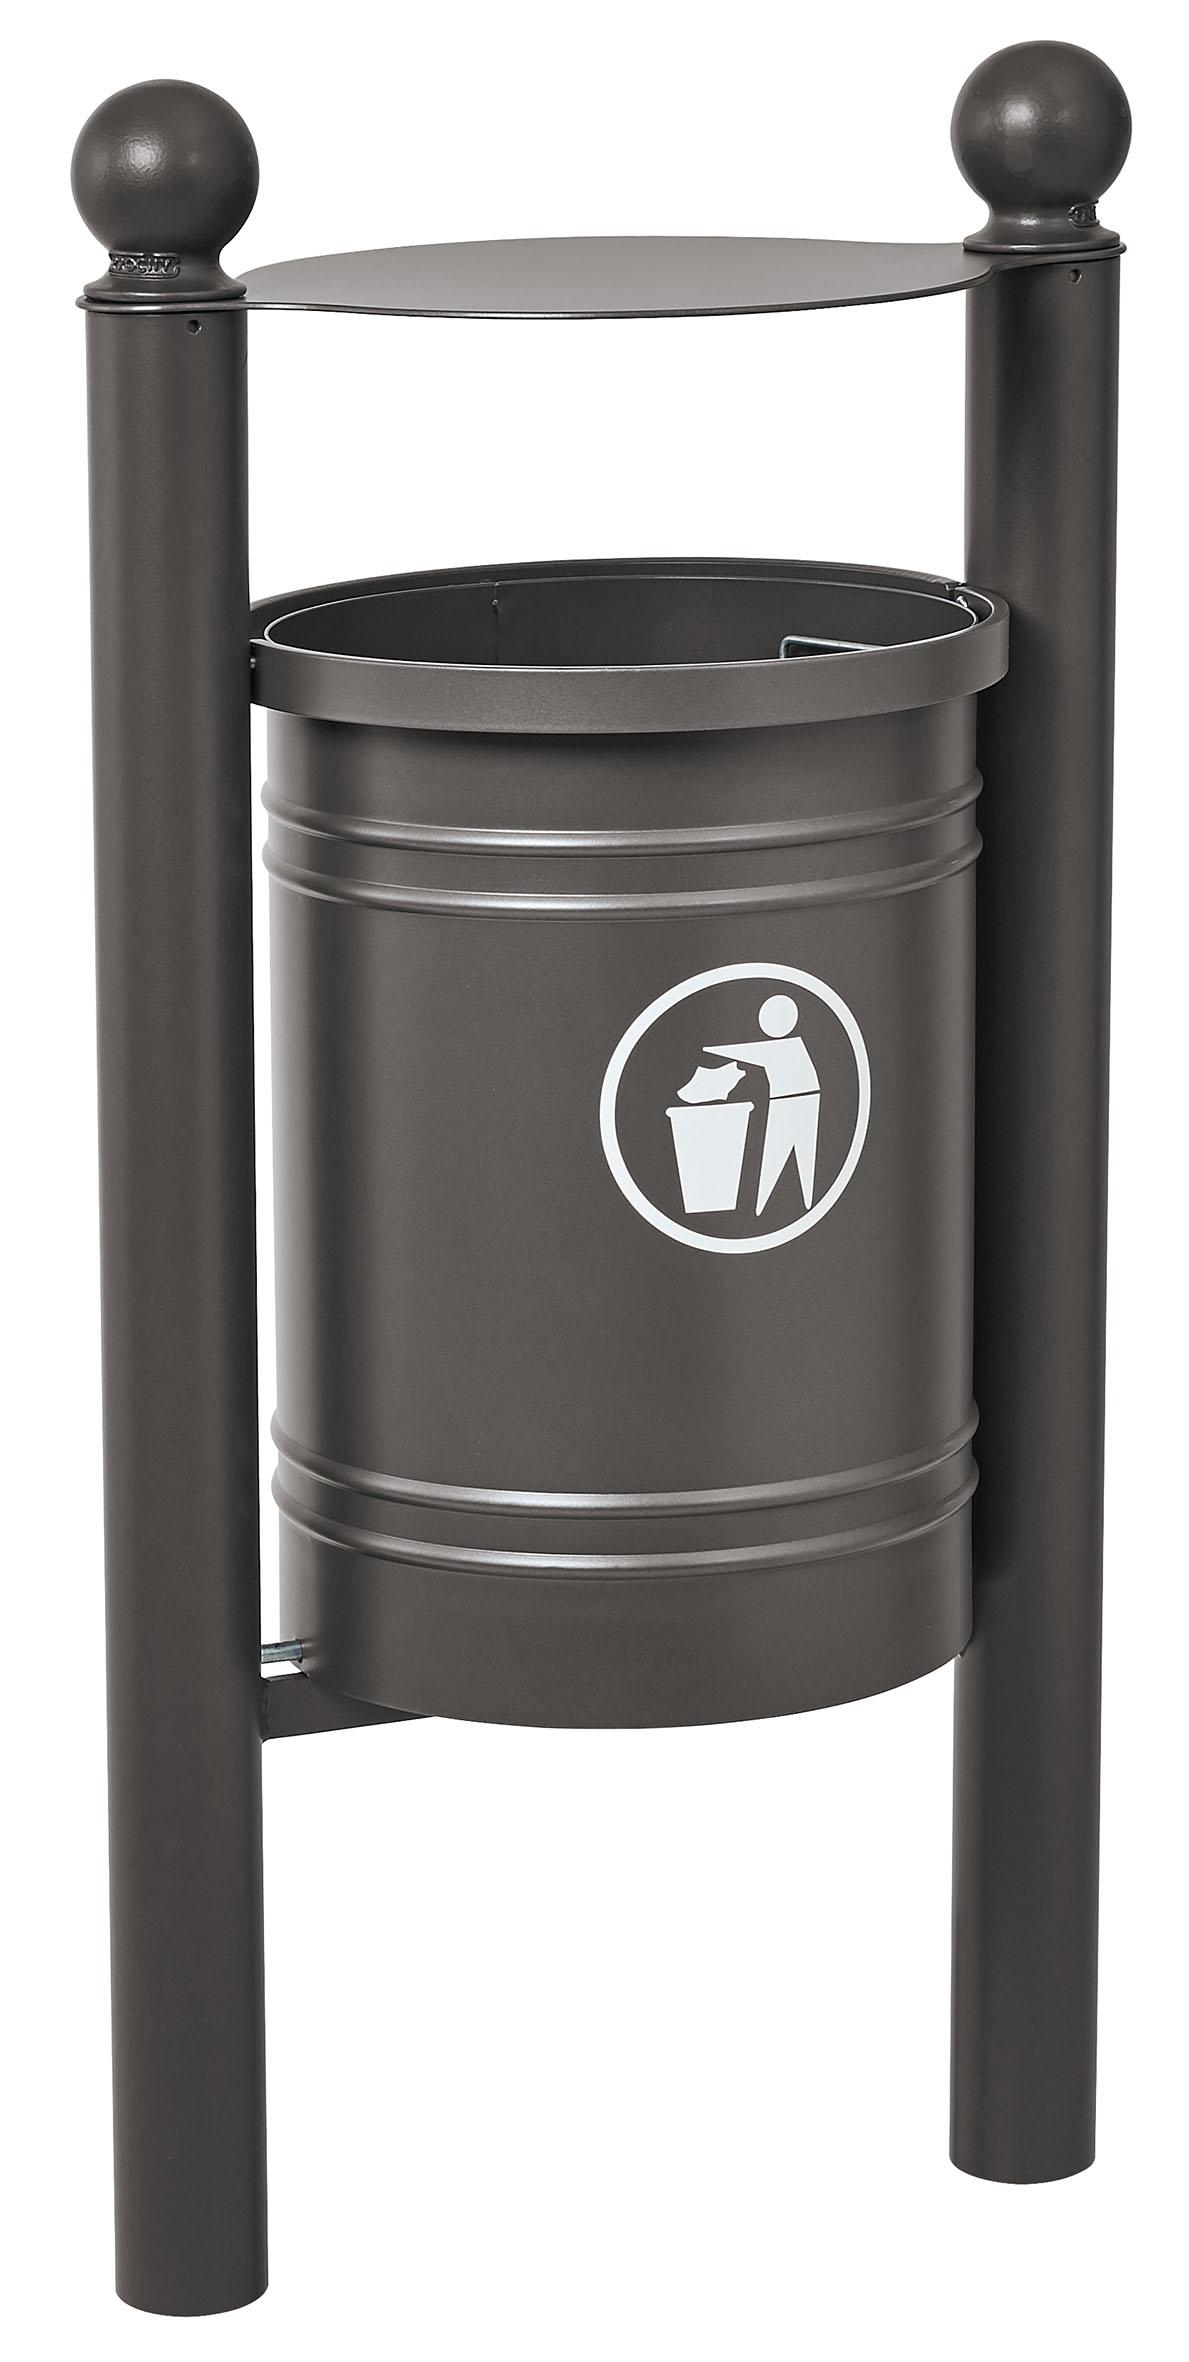 Abfallkorb Santiago 40 Liter